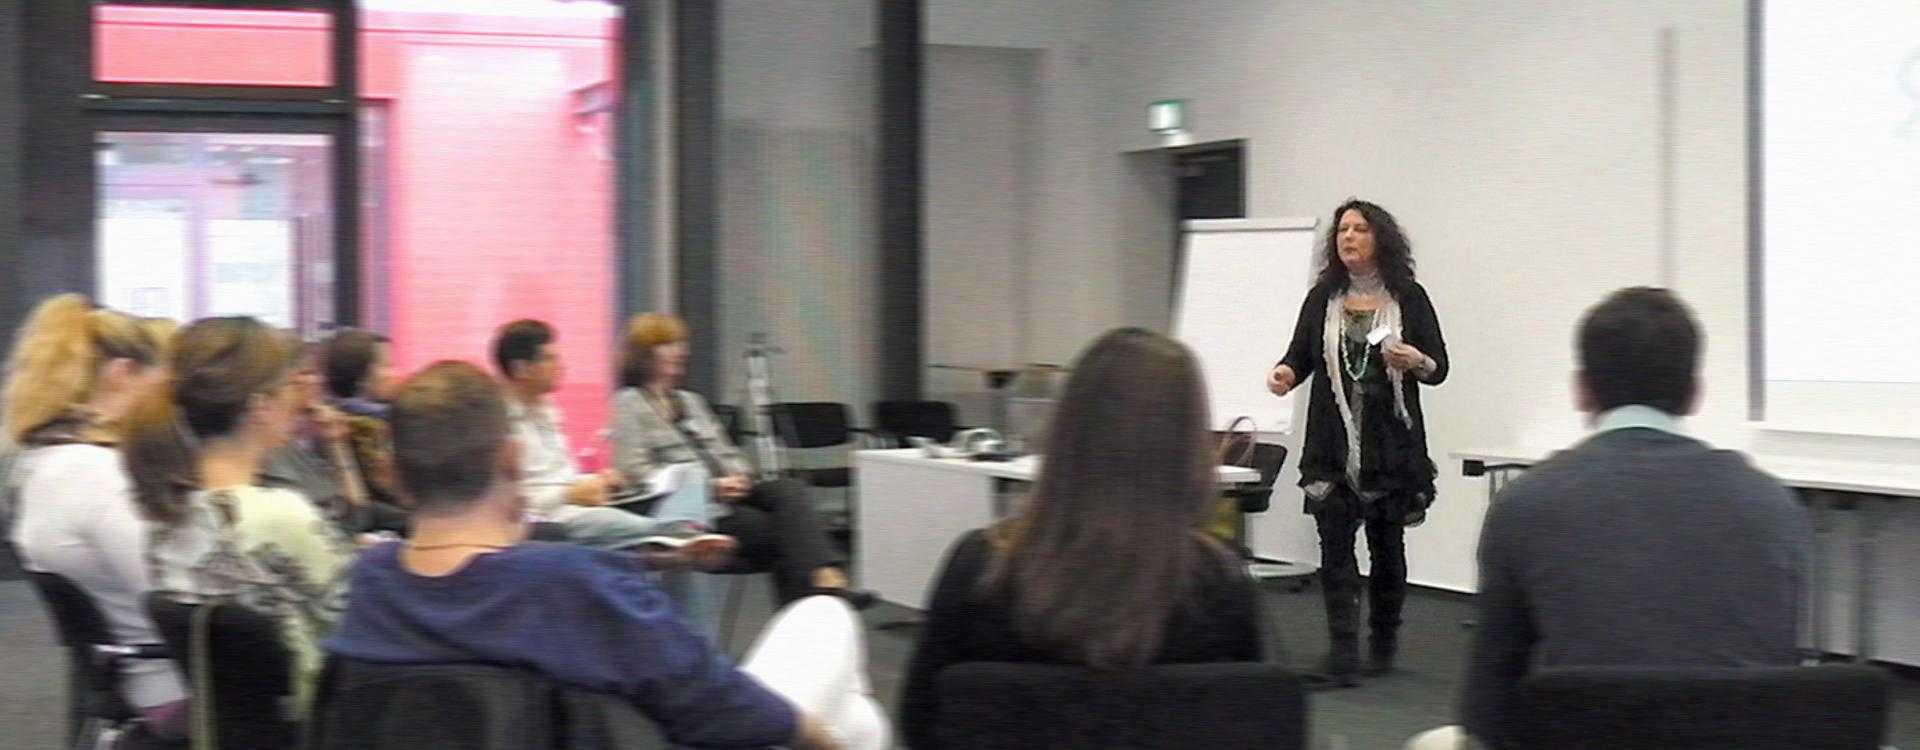 Seminare Steps Stuttgart Trainings Inhouse offen Firmenseminare